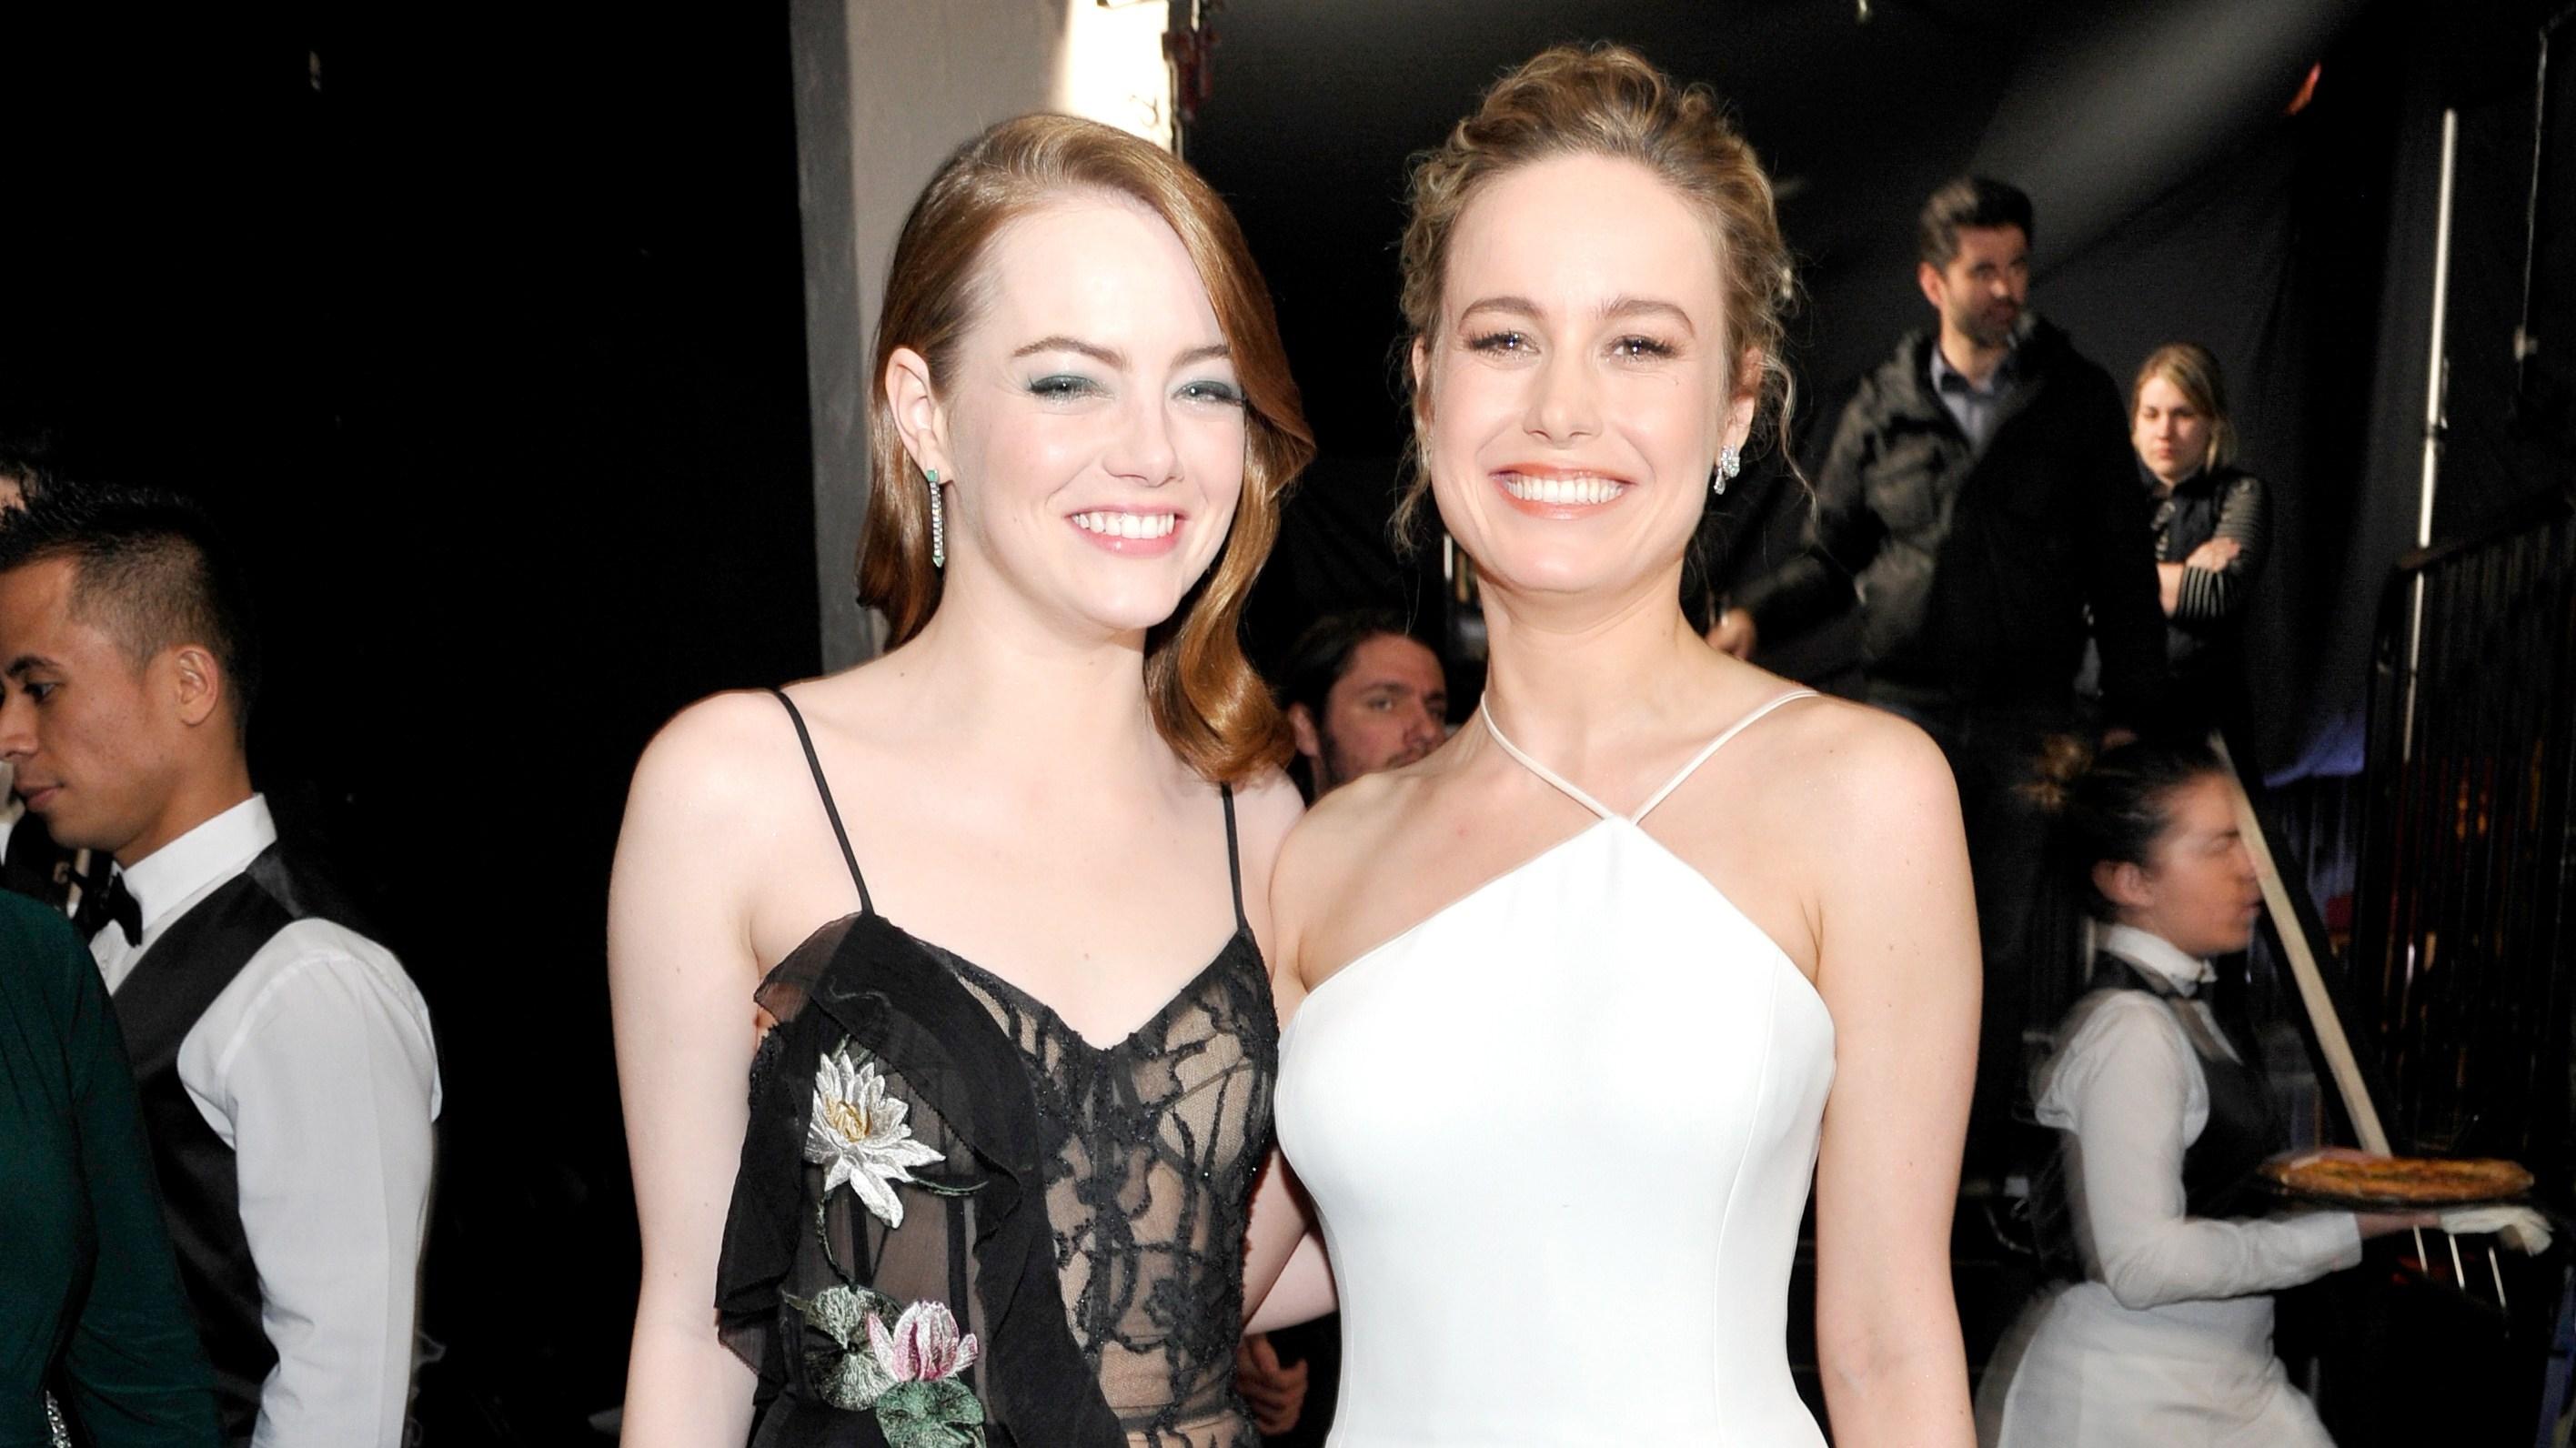 Emma Stone and Brie Larson in L.A.